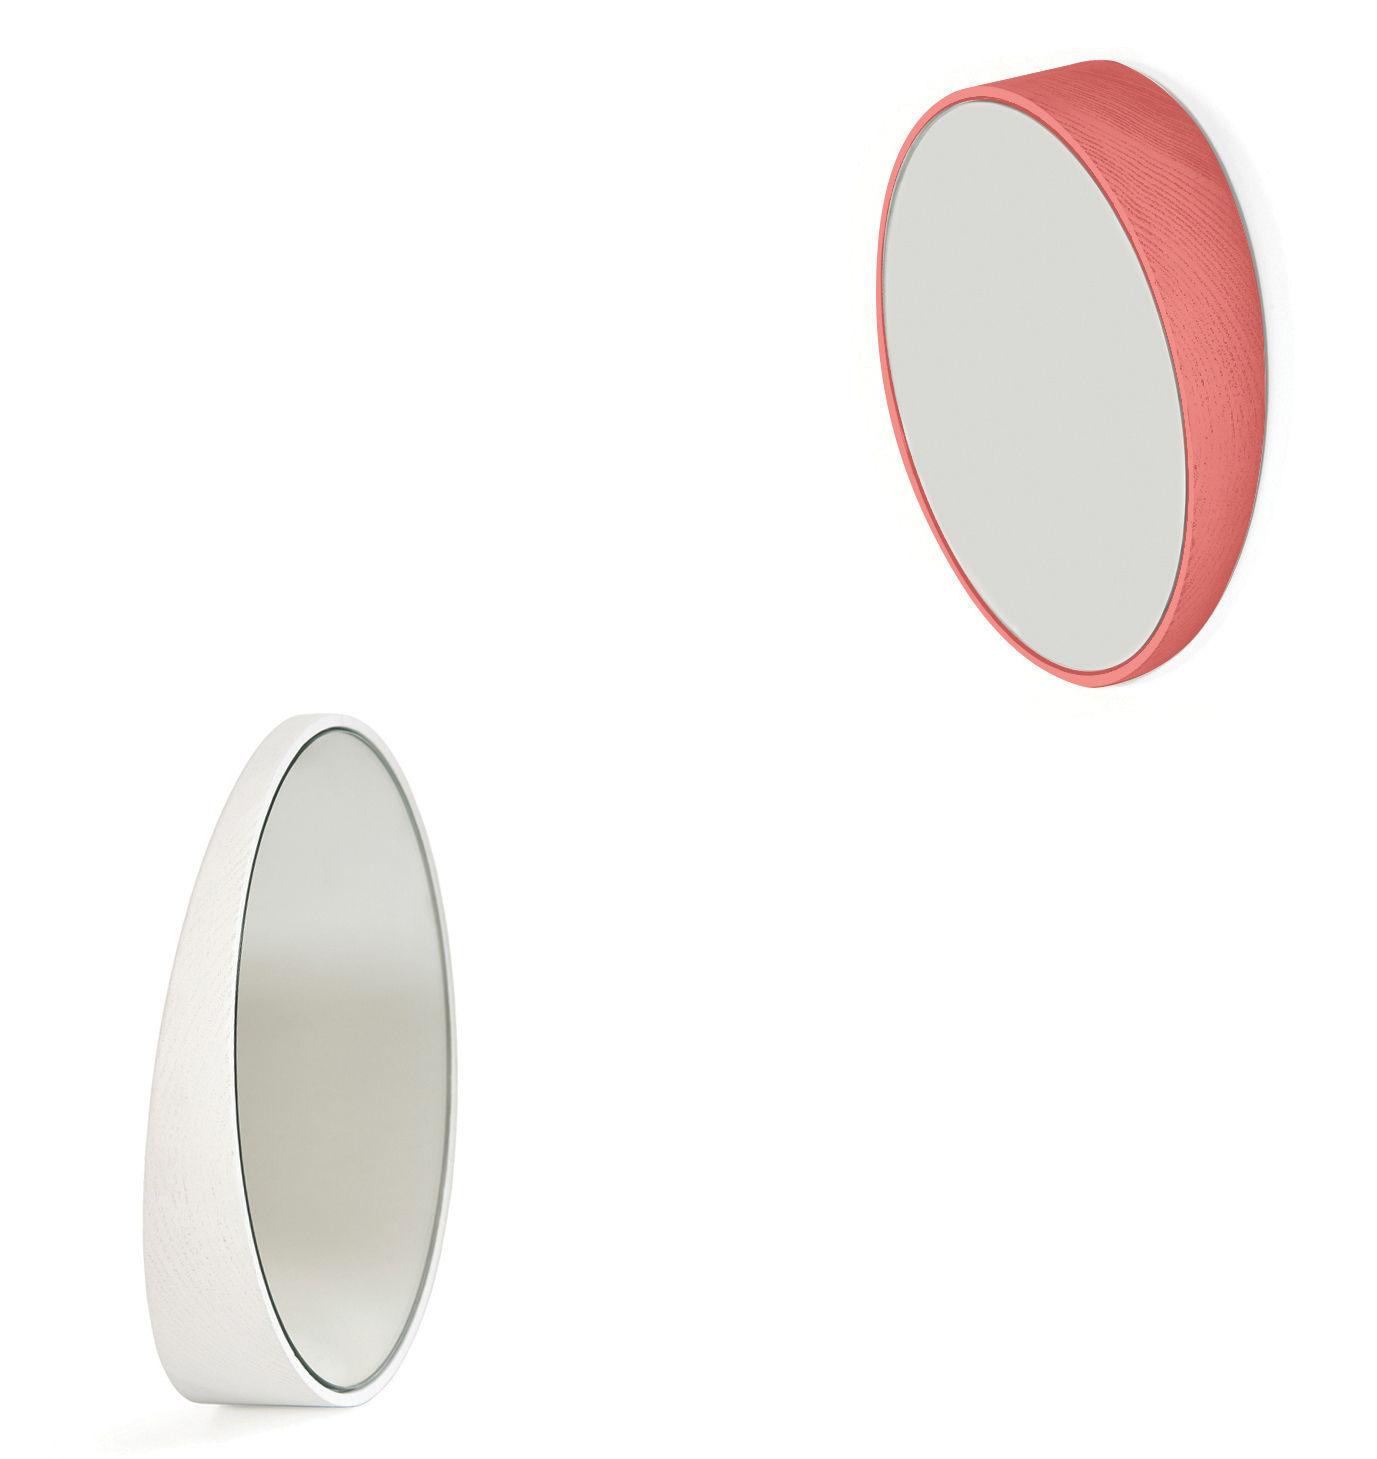 odilon small spiegel 25 cm korallrot by hart made in design. Black Bedroom Furniture Sets. Home Design Ideas